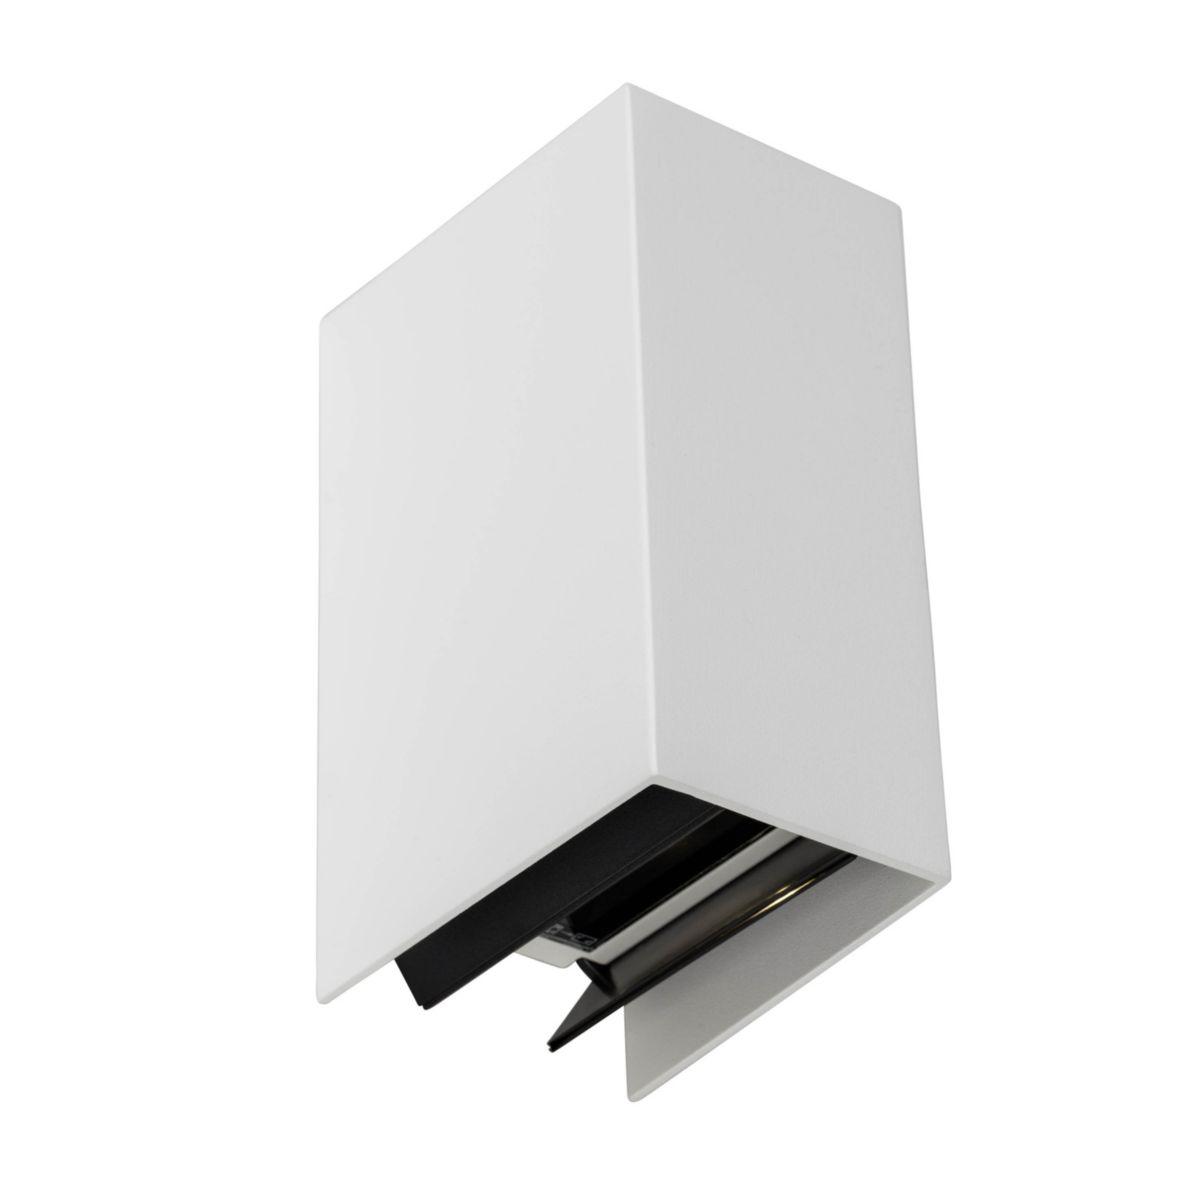 AEG Adapt LED Außenwandstrahler, 2-flammig weiß...